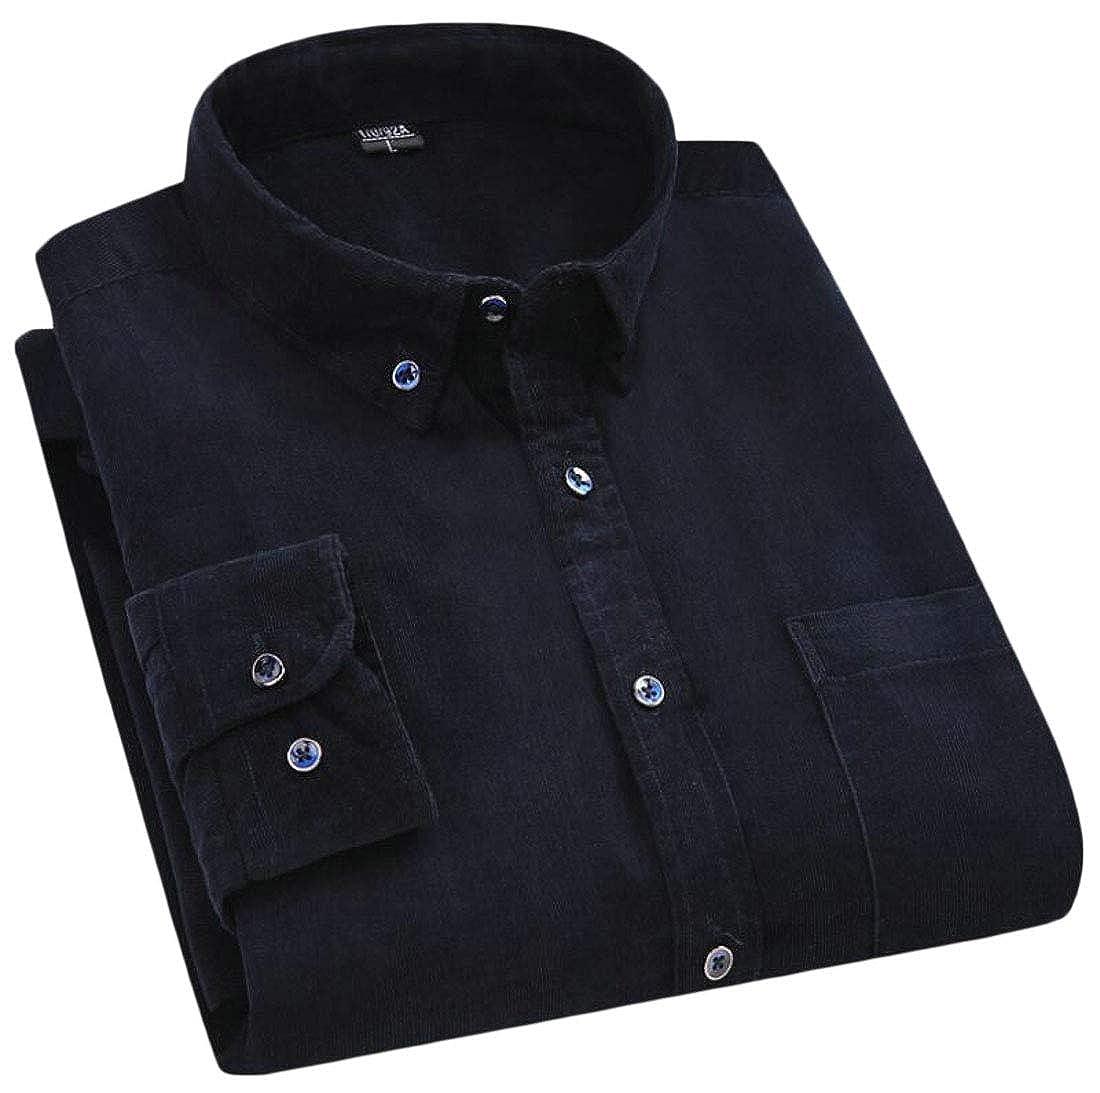 GAGA Mens Corduroy Button Down Collar Slim Fit Long Sleeves Casual Shirt